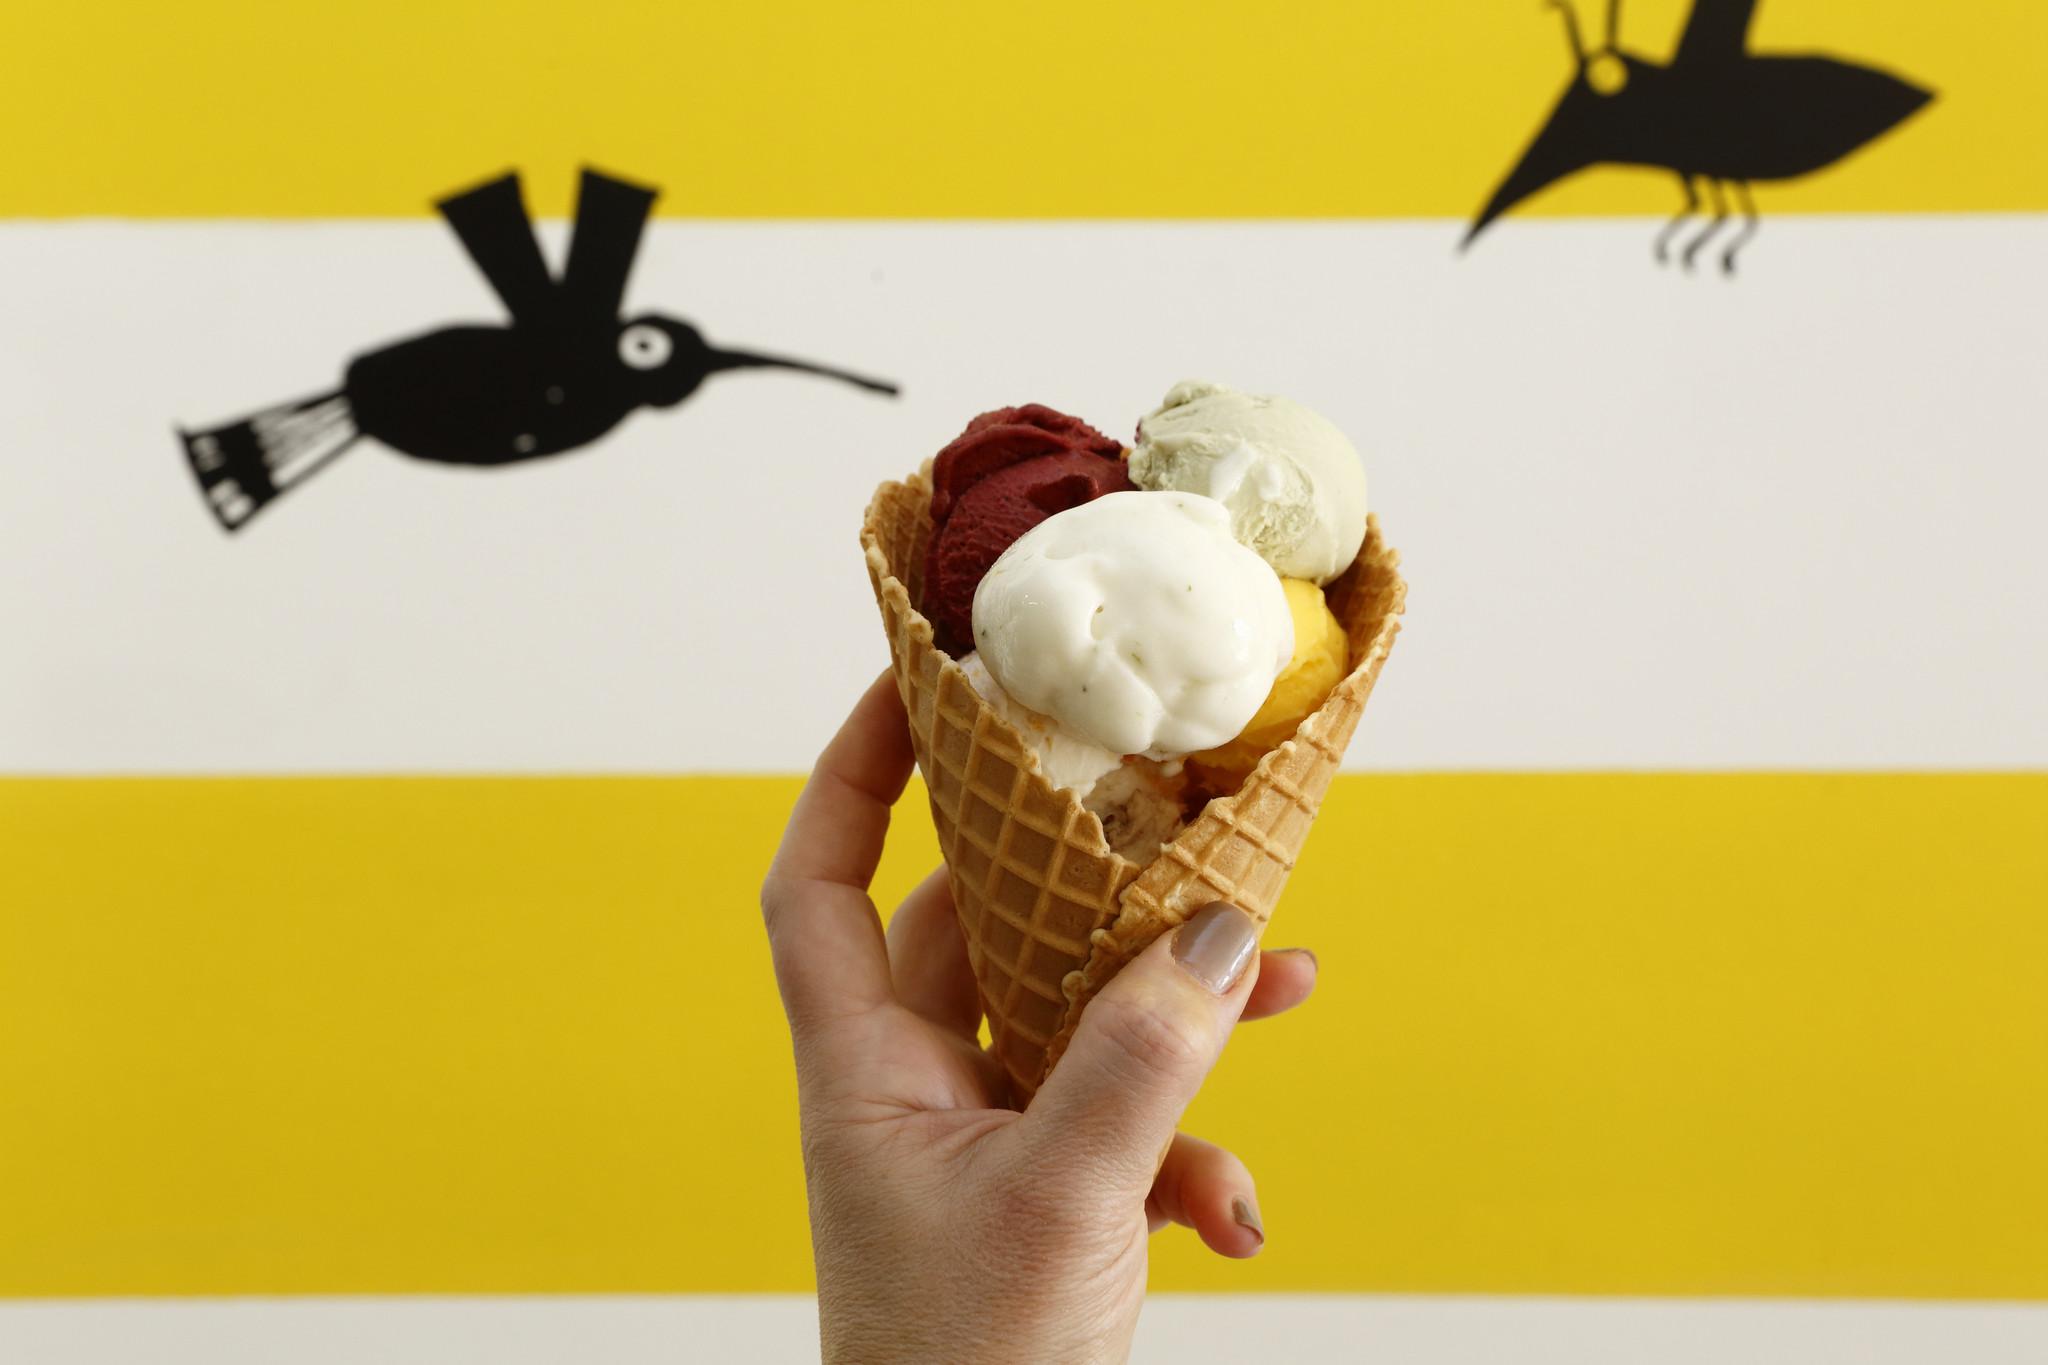 mj gelataria giallo-20-03-2023-mj.jpg